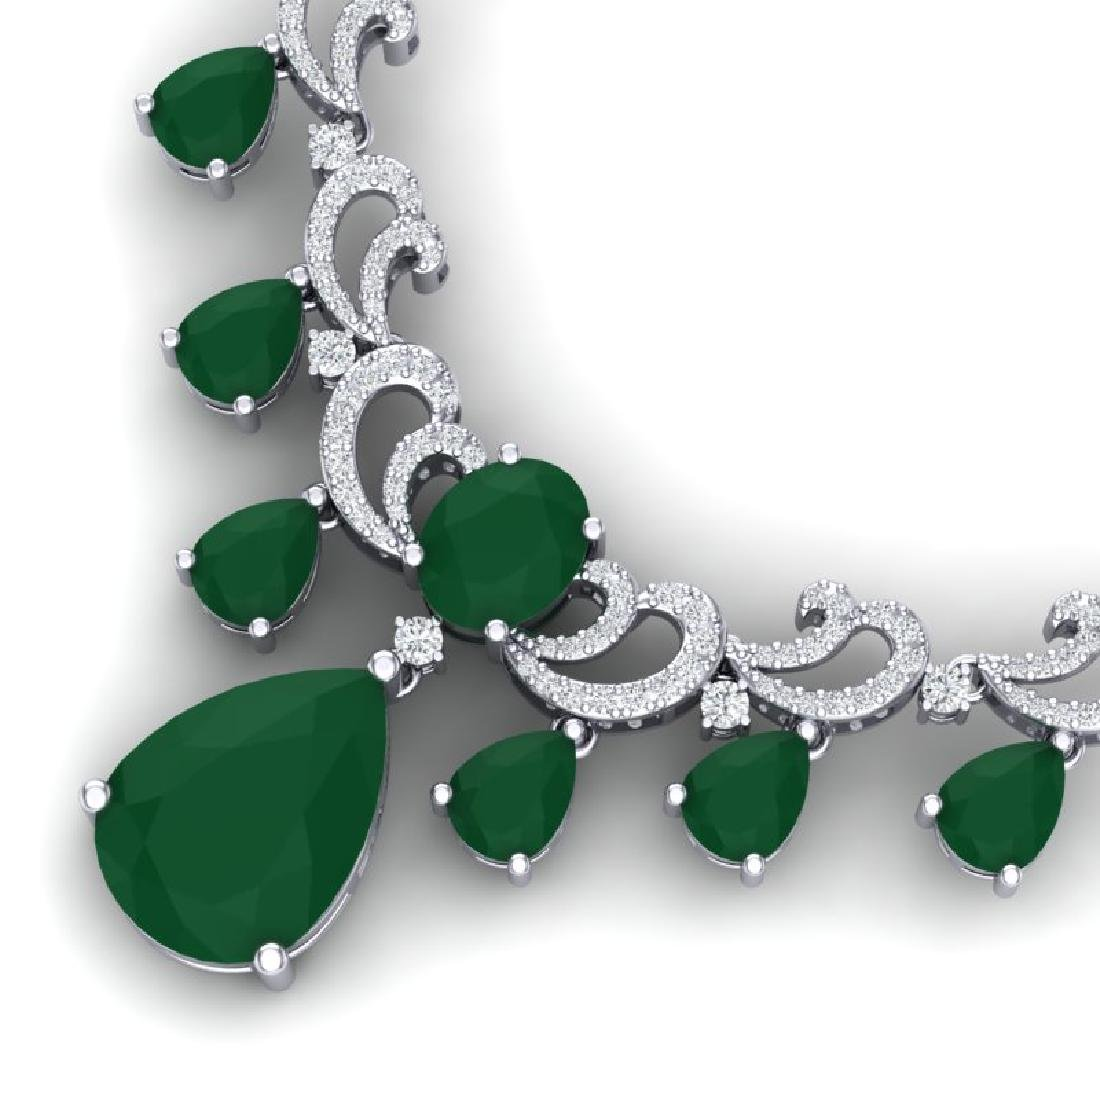 36.85 CTW Royalty Emerald & VS Diamond Necklace 18K - 2